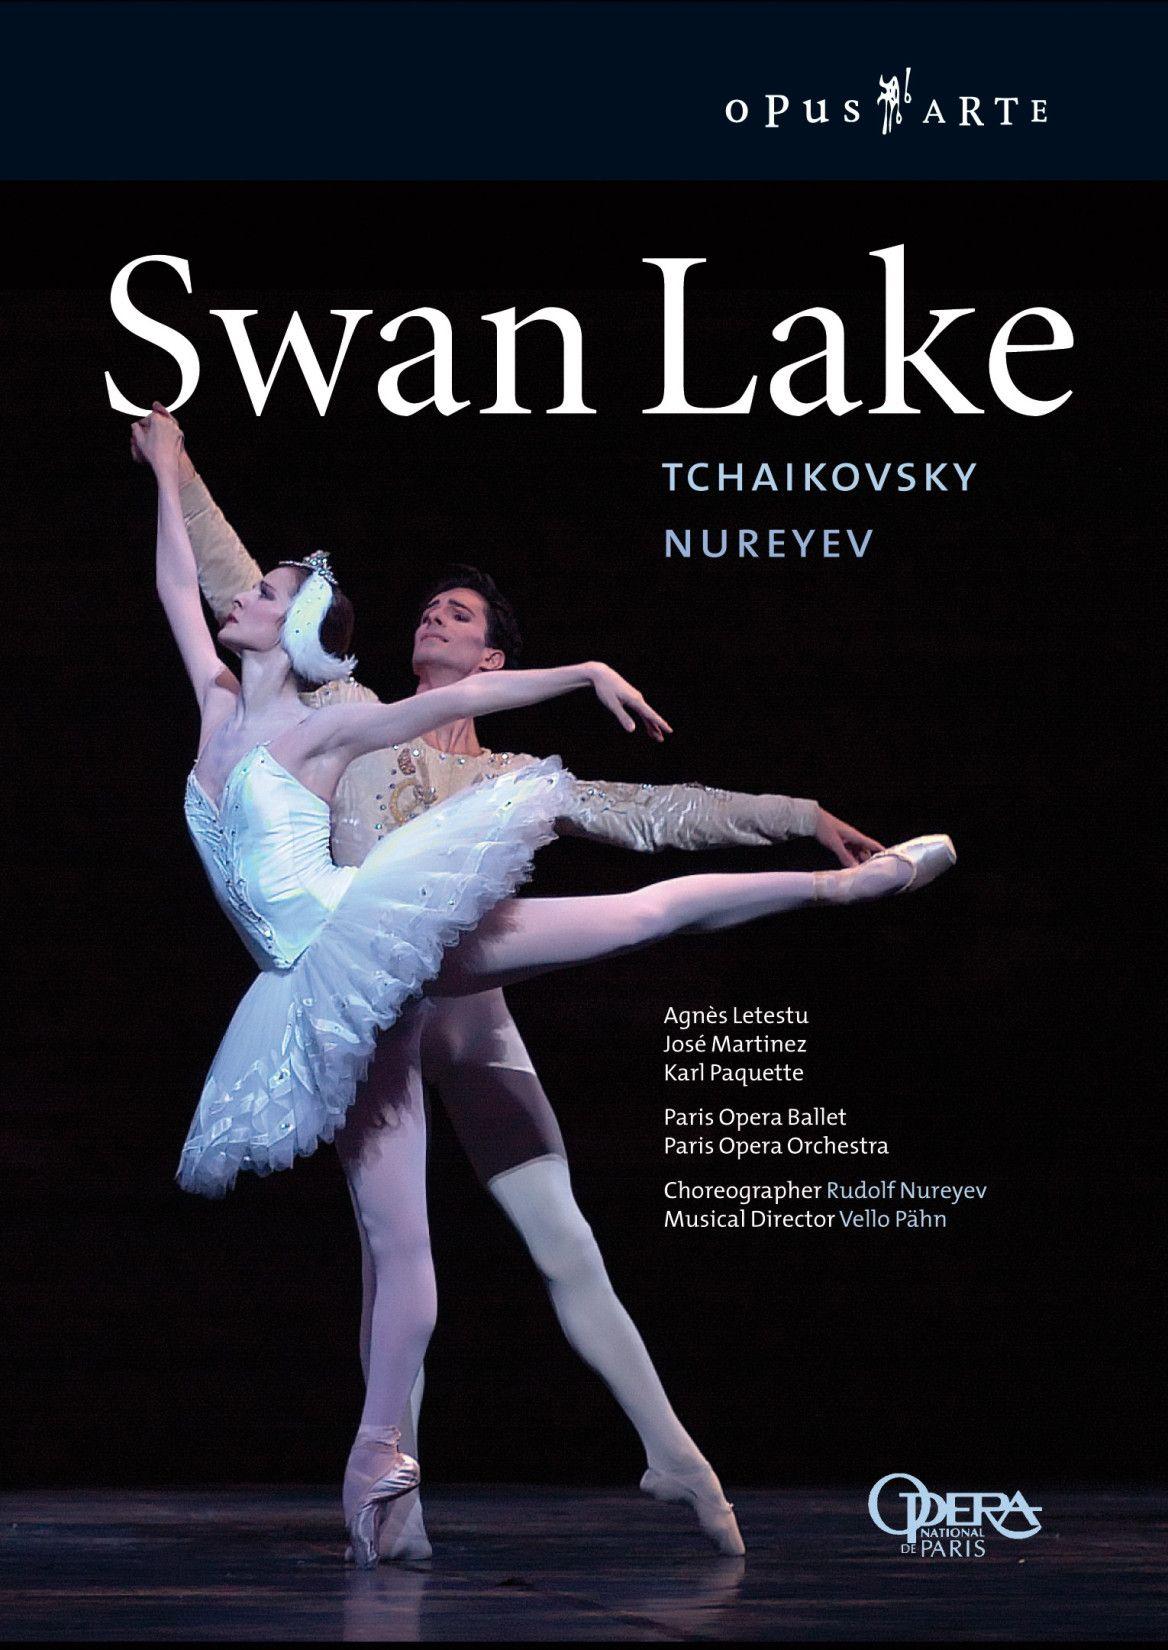 Pin by Sassa.Bzr on Ballet, Opéra et concert classique in